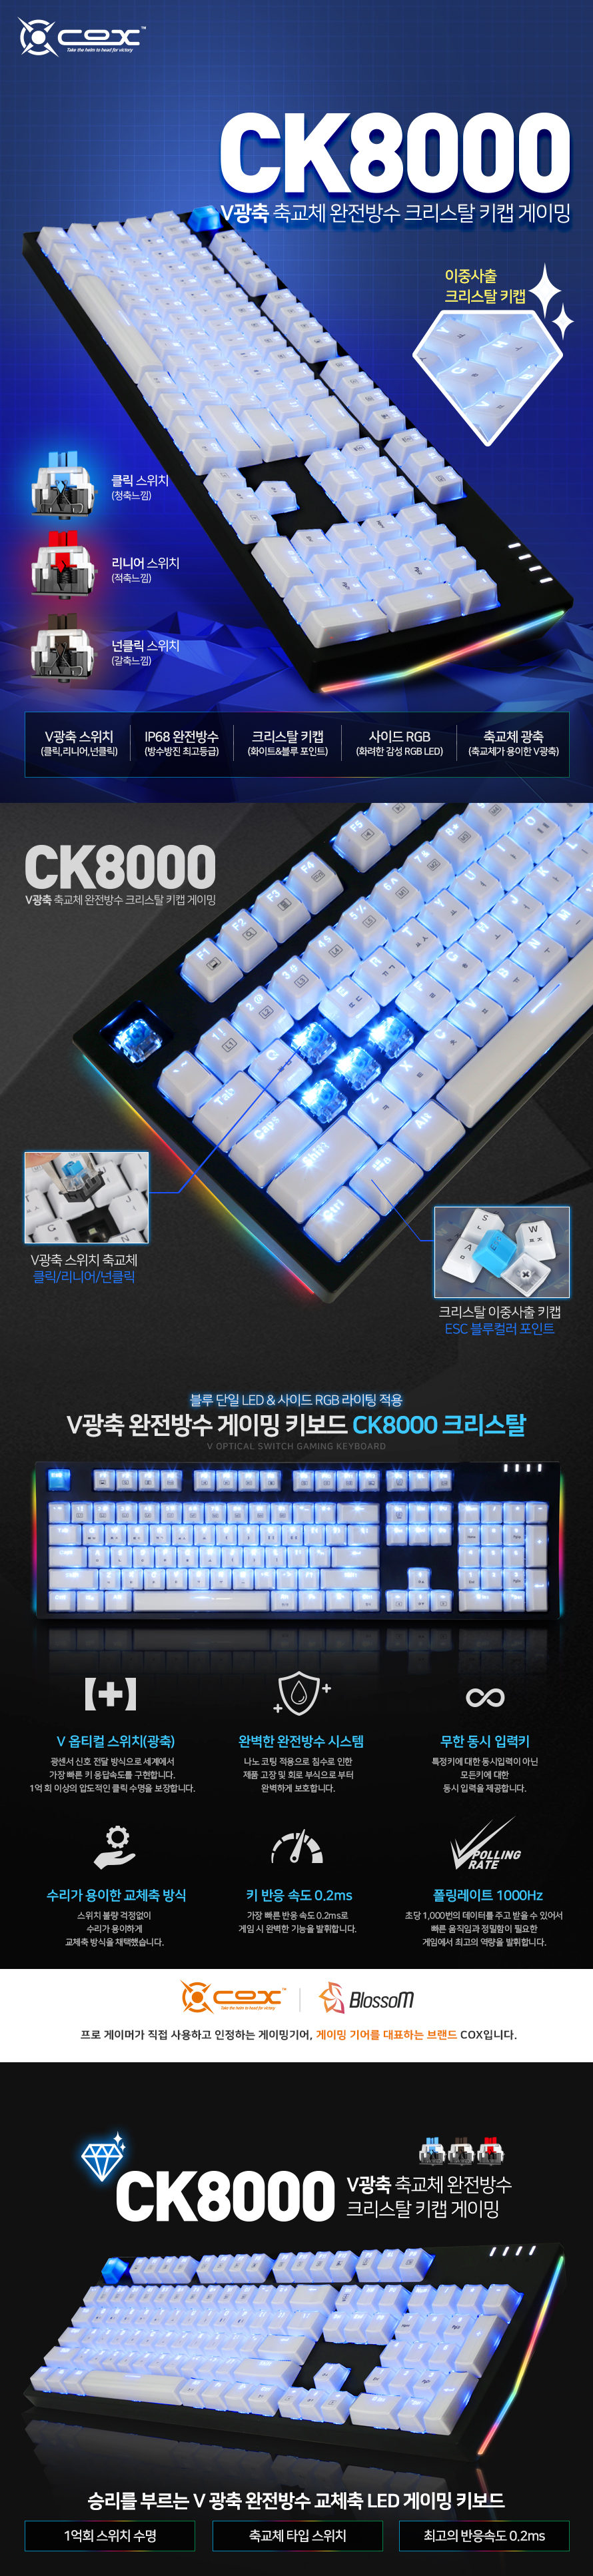 COX  CK8000 V광축 완전방수 크리스탈 키캡 교체축 사이드 RGB 게이밍(클릭)